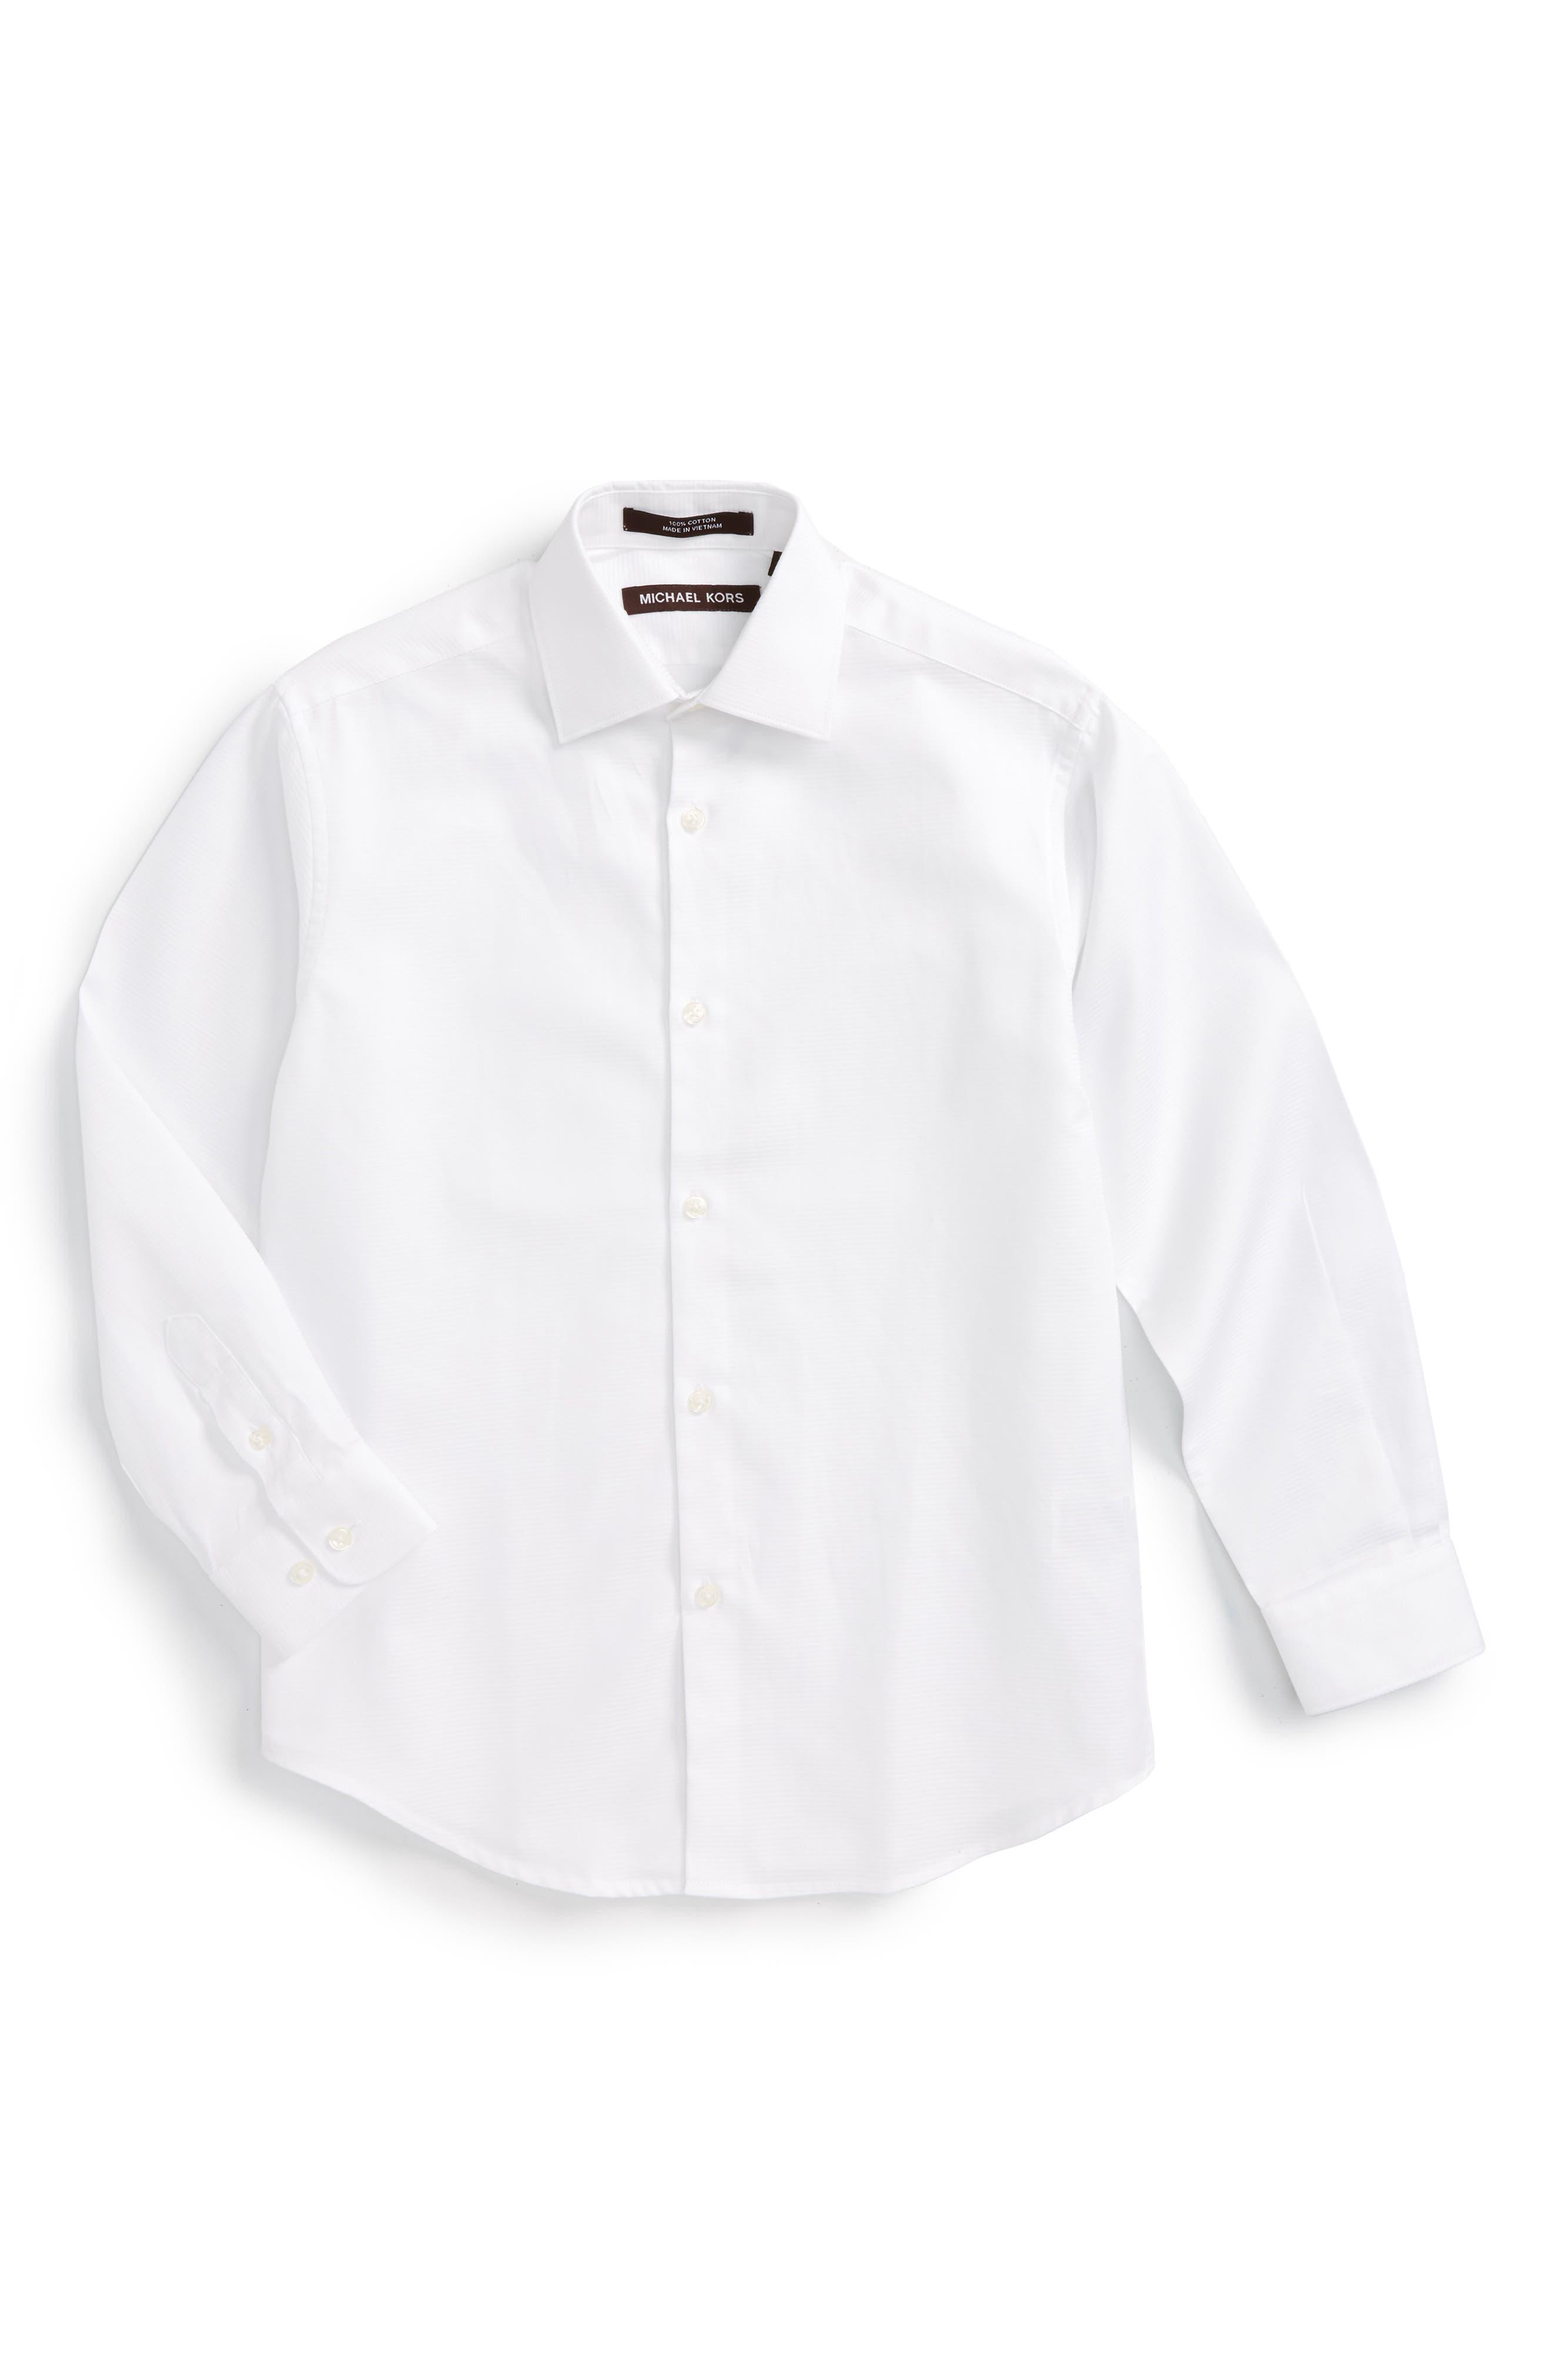 MICHAEL KORS, Solid Dress Shirt, Main thumbnail 1, color, WHITE